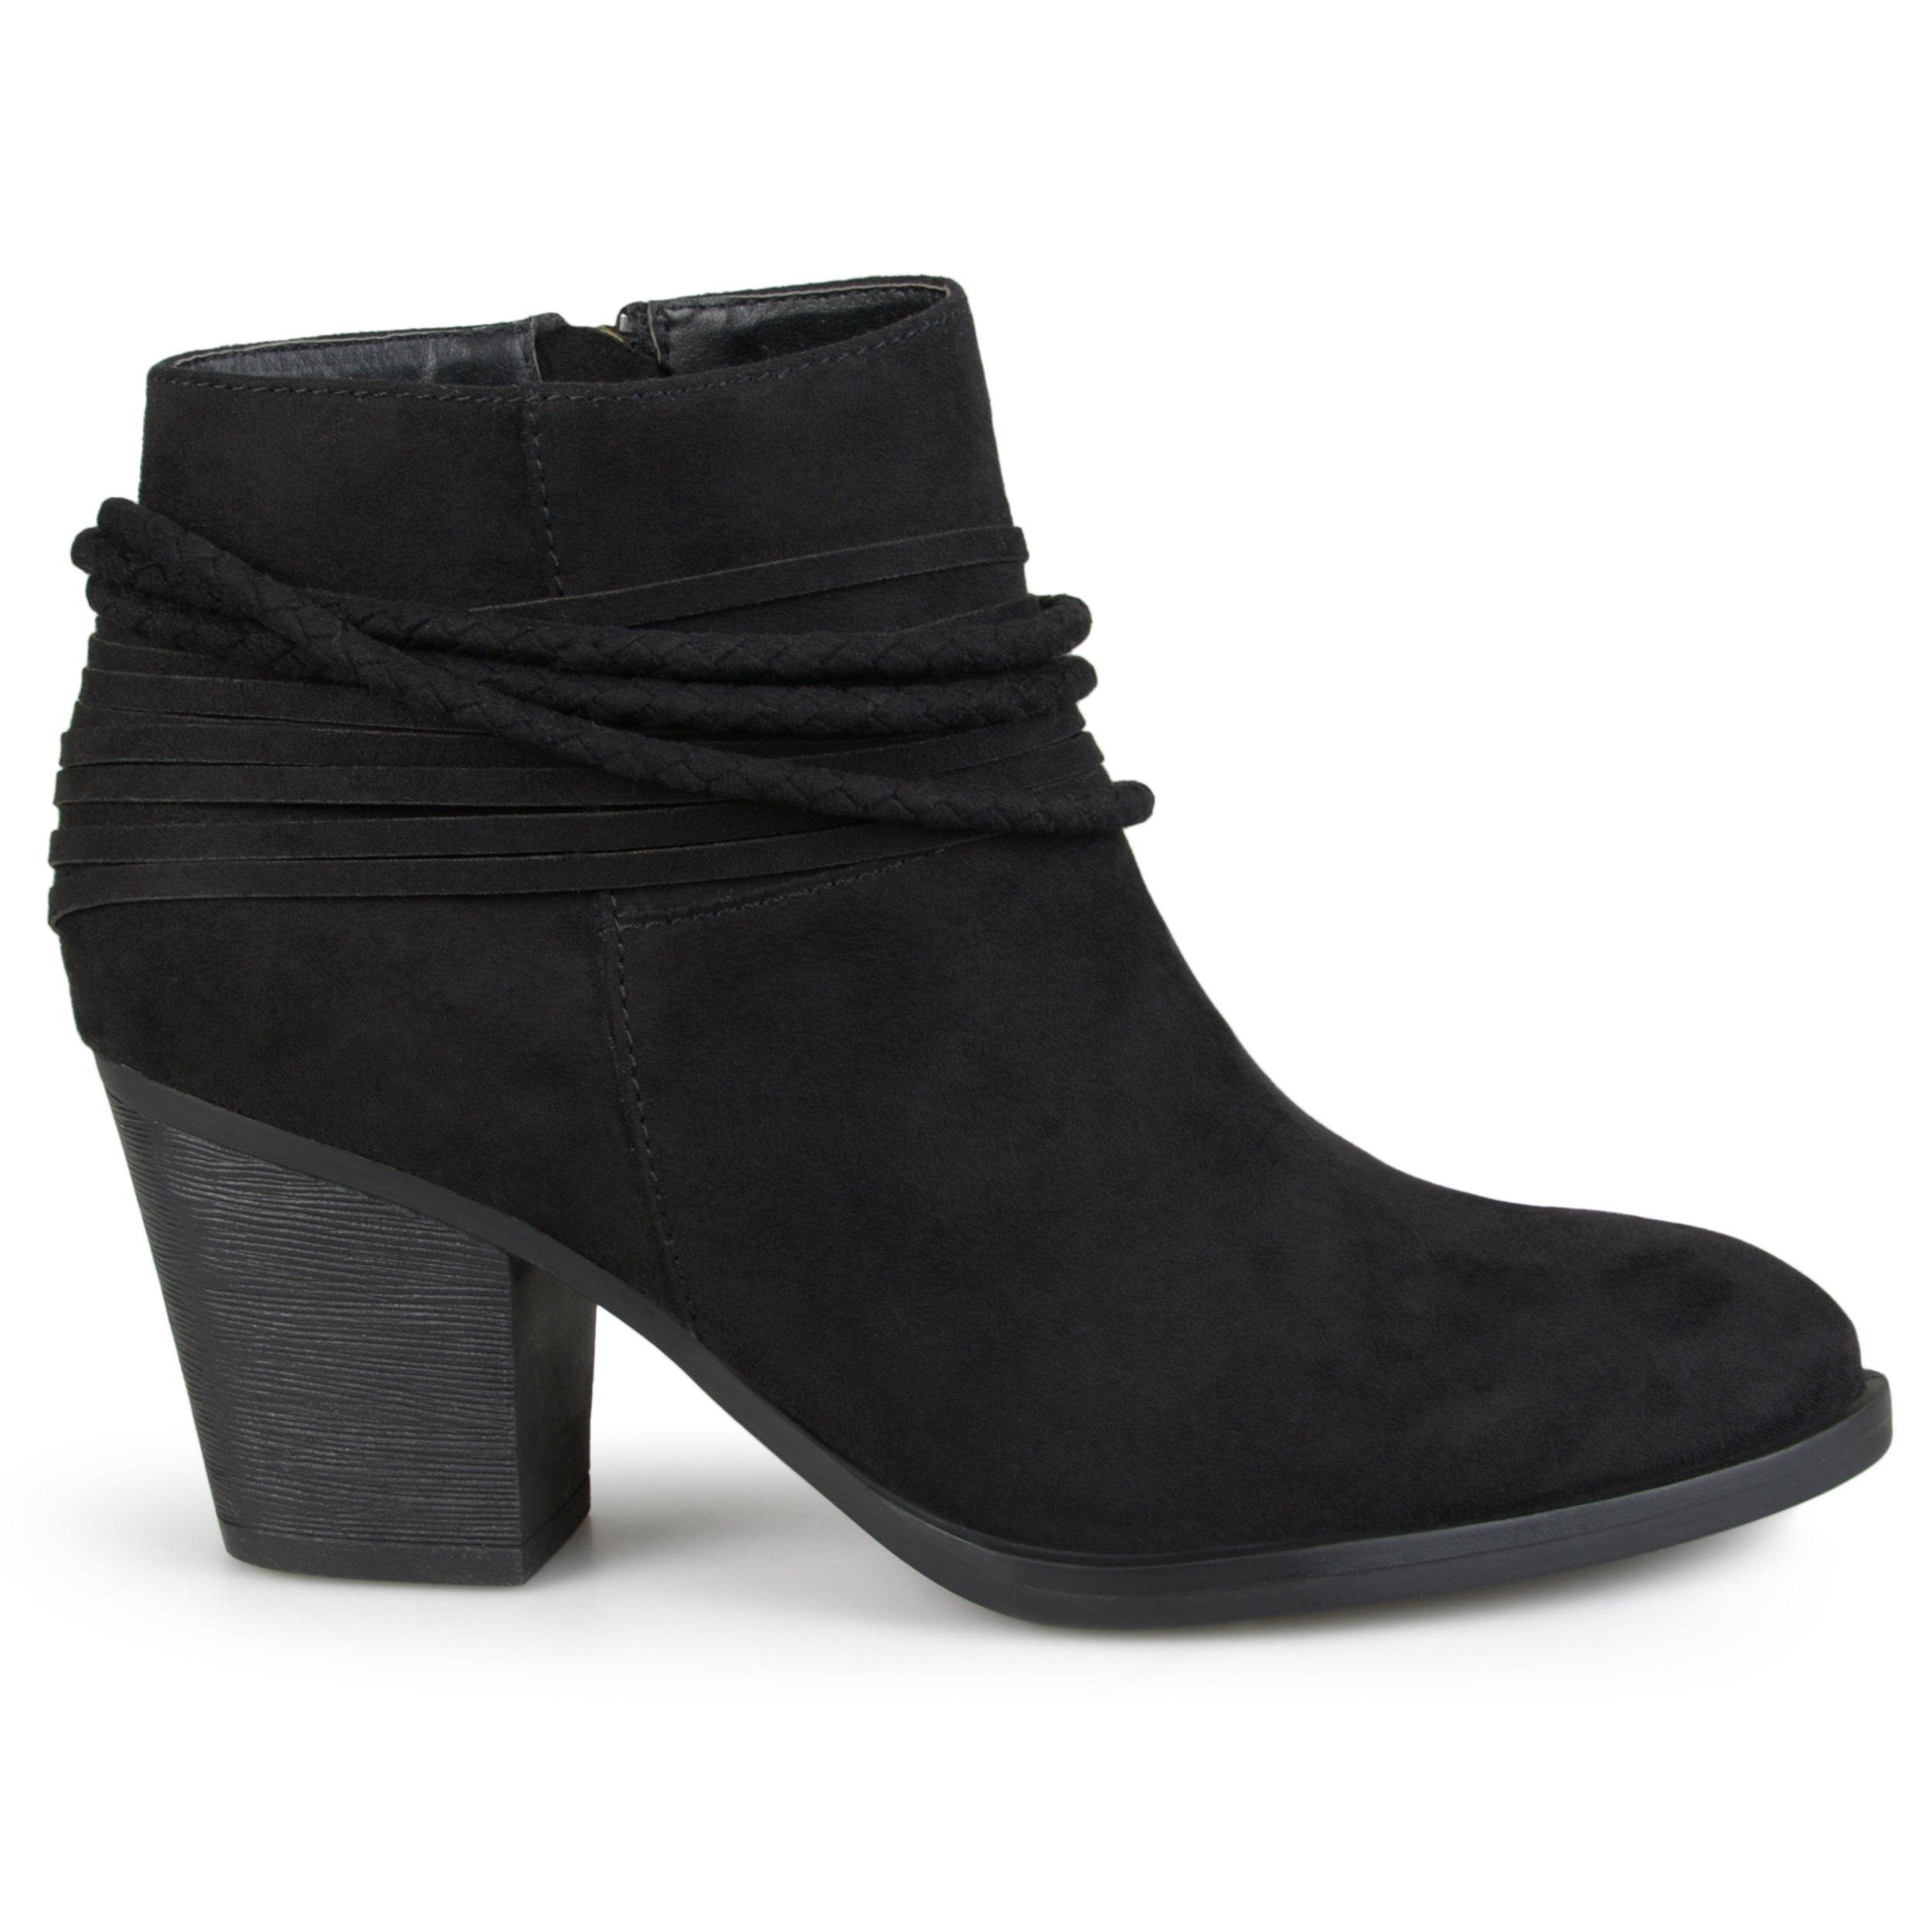 Brinley Co Women's Chase Ankle Boot, Black, 9 Regular US